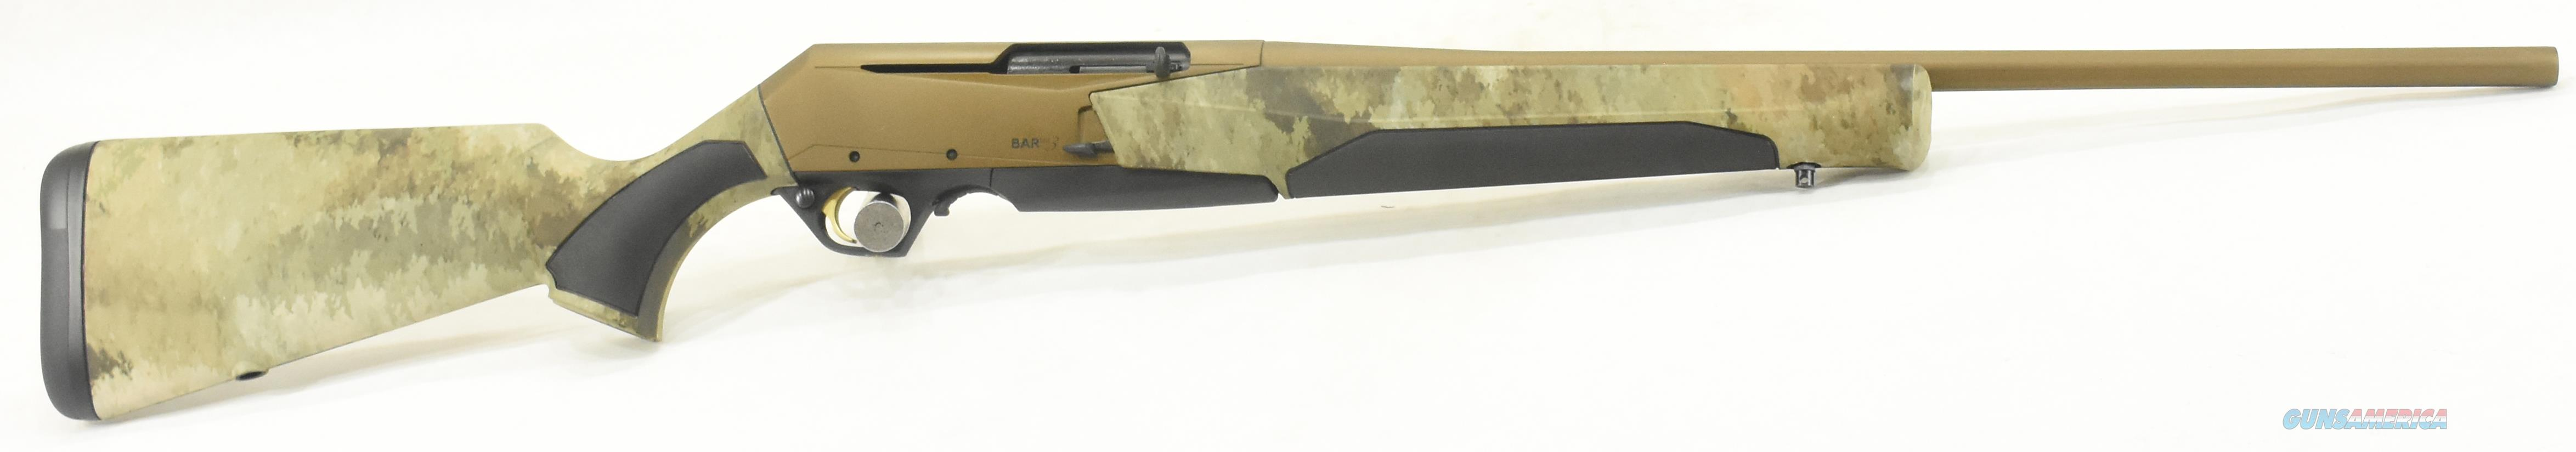 031064211 Browning BAR Mark III Hells Canyon Speed 243 Win  Guns > Rifles > Browning Rifles > Semi Auto > Hunting